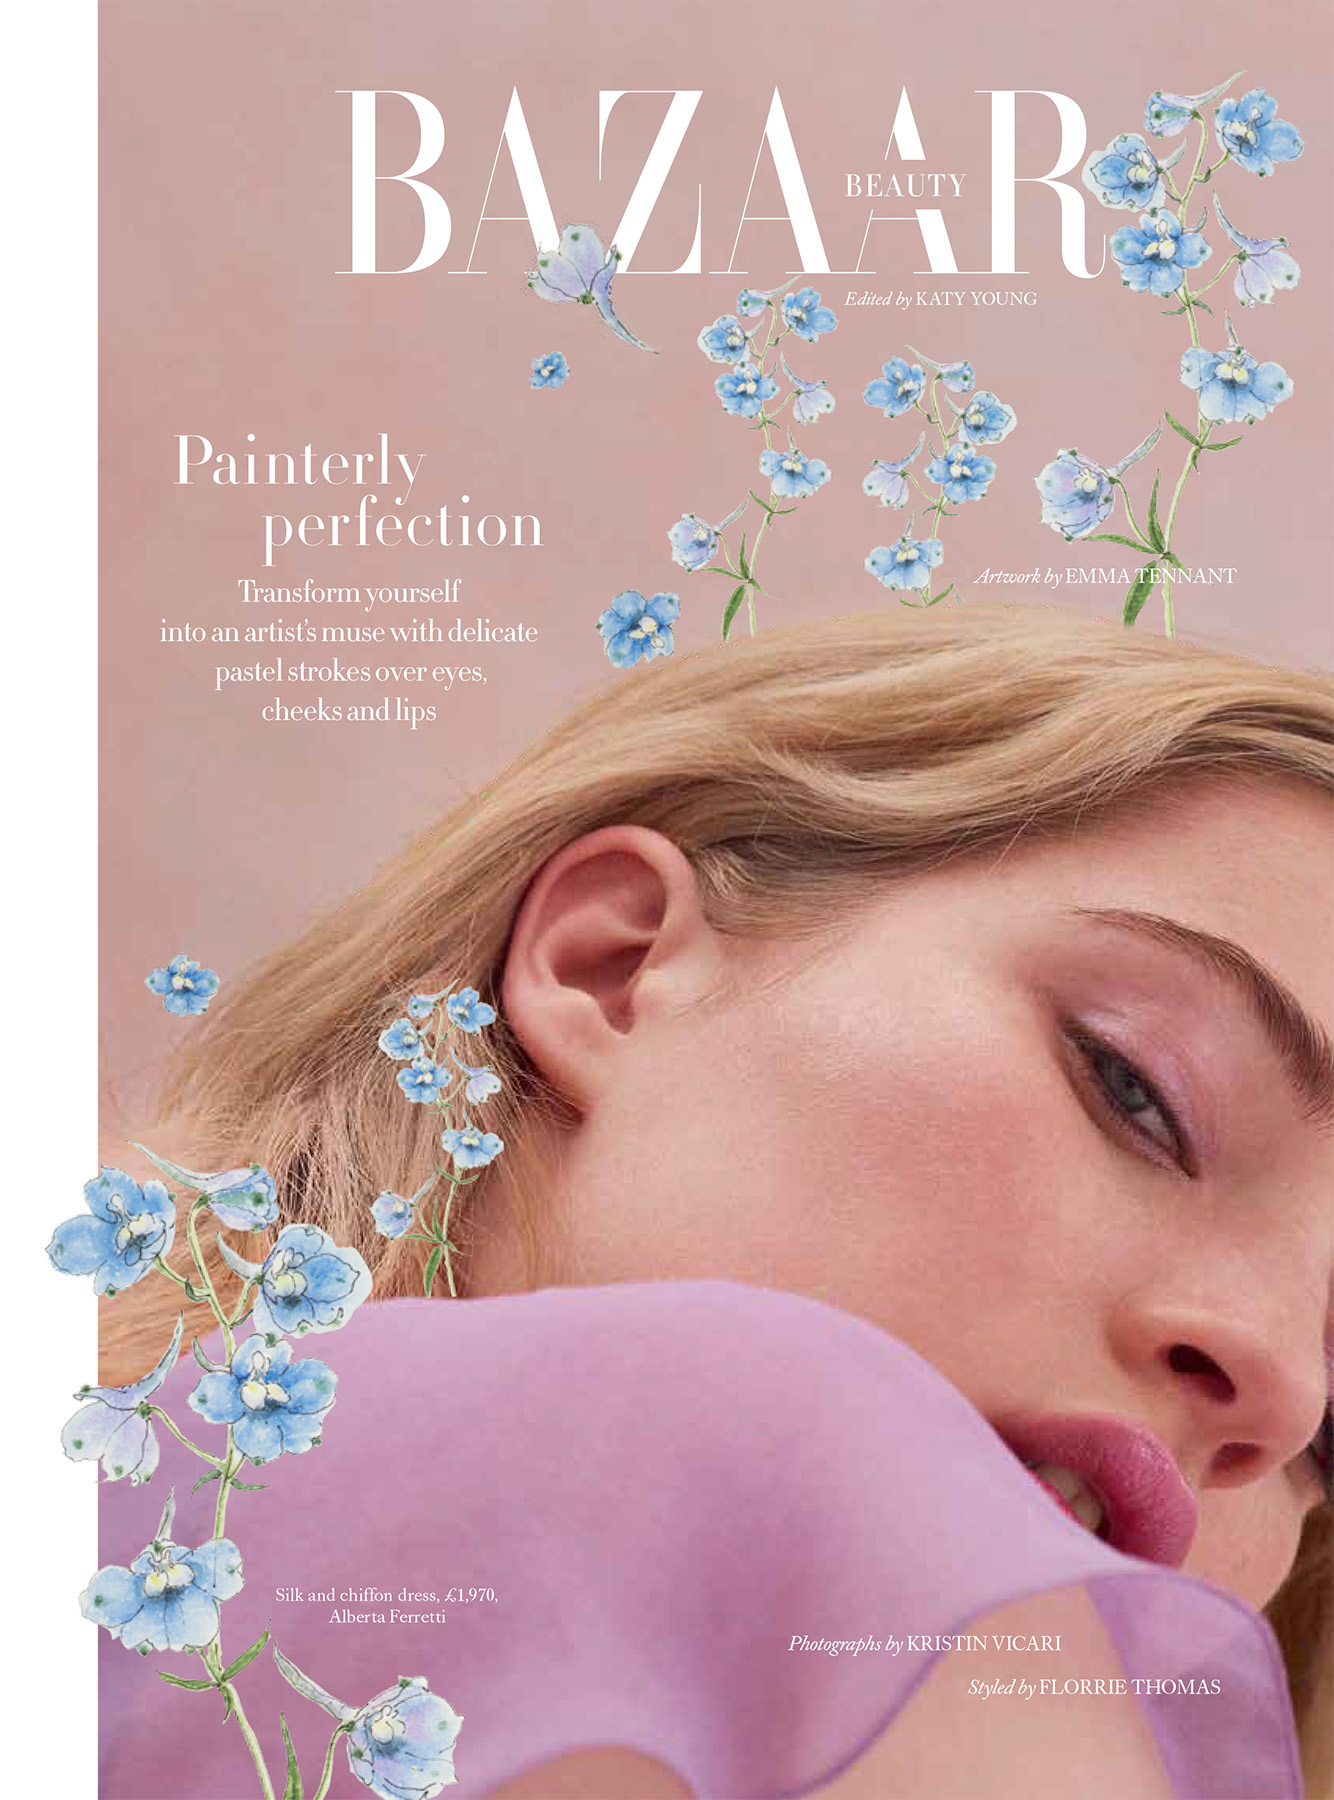 001-icon-artist-management-Kristin-Vicari-Beauty-Harpers Bazaar 1.jpg